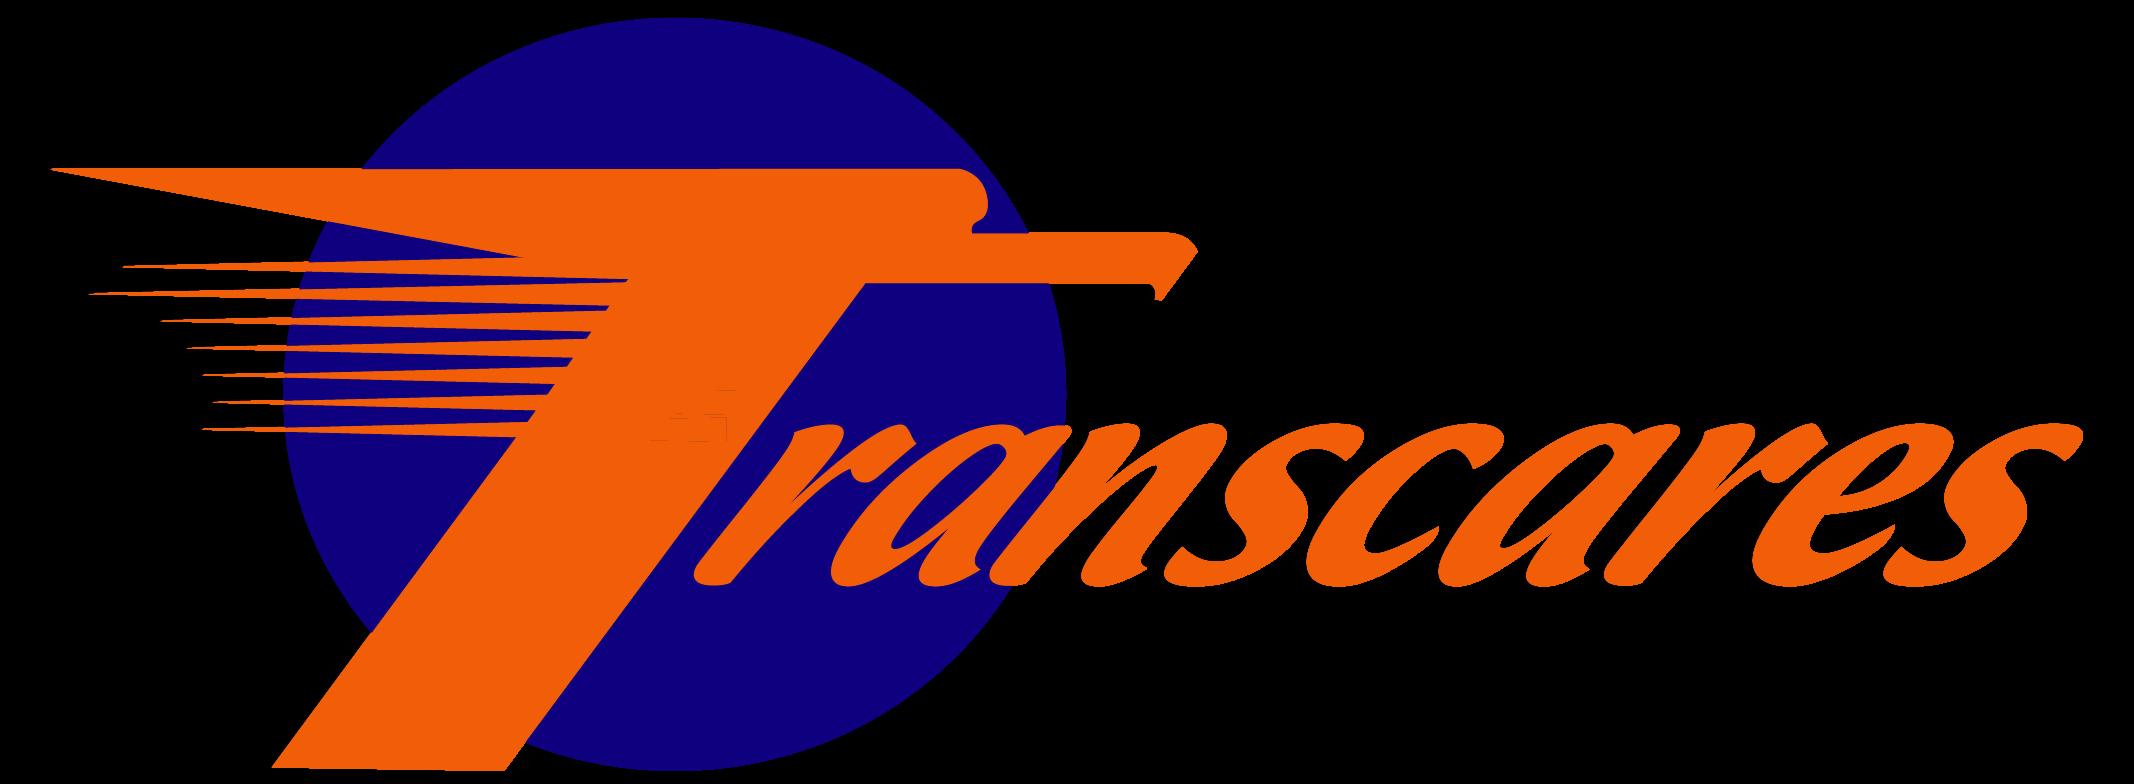 Transcares S.A.S